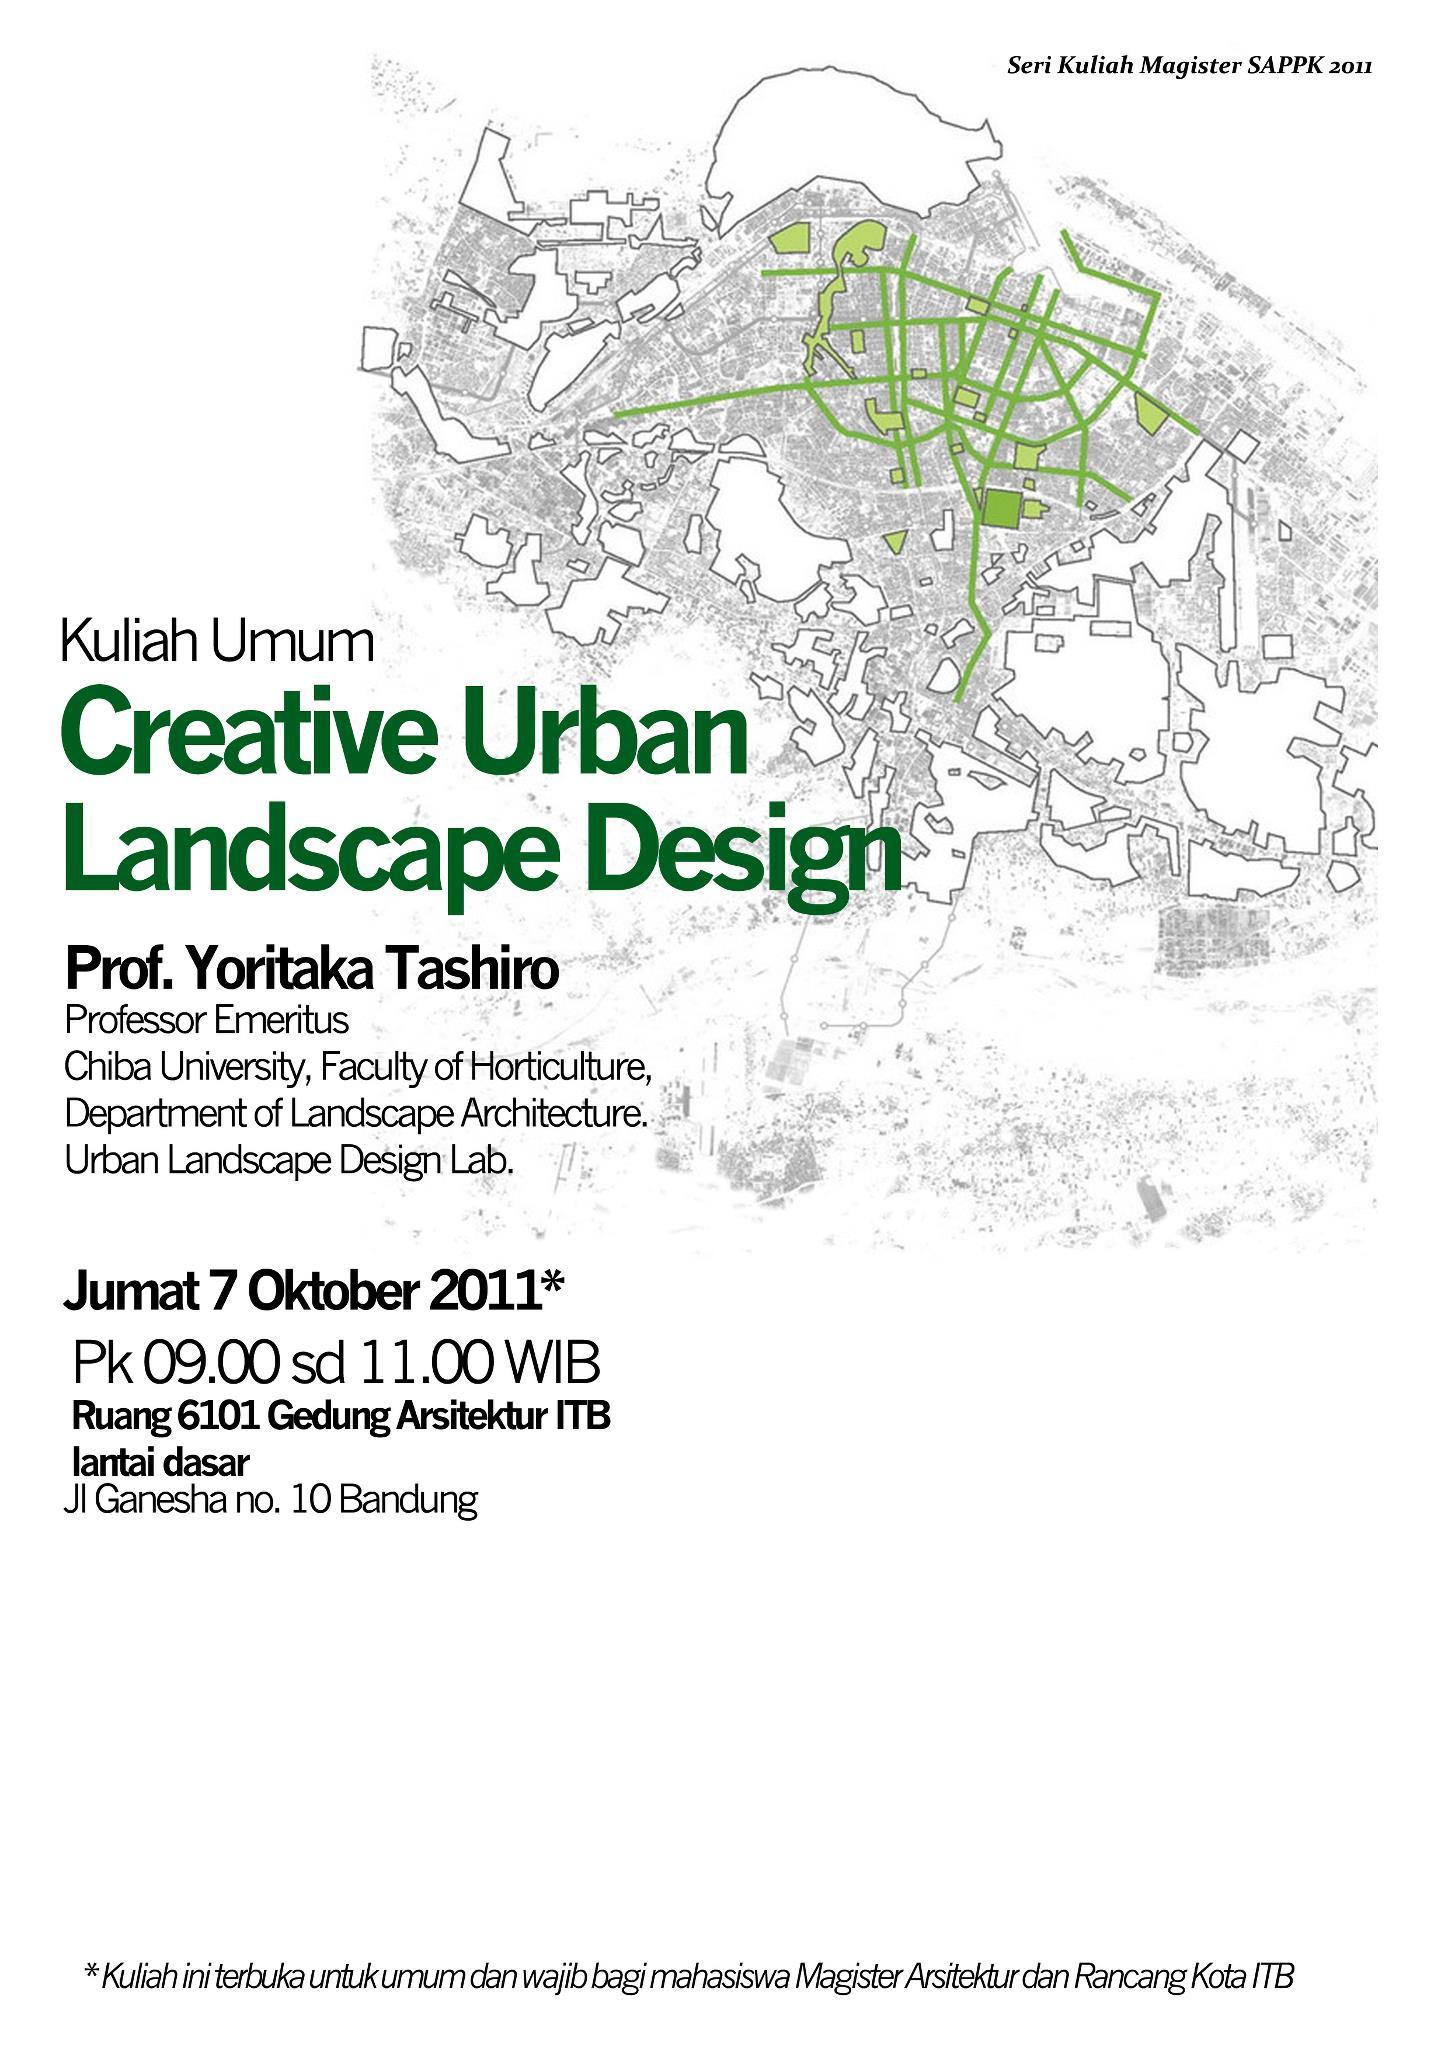 entry level landscape architecture jobs. landscape designer salary ...